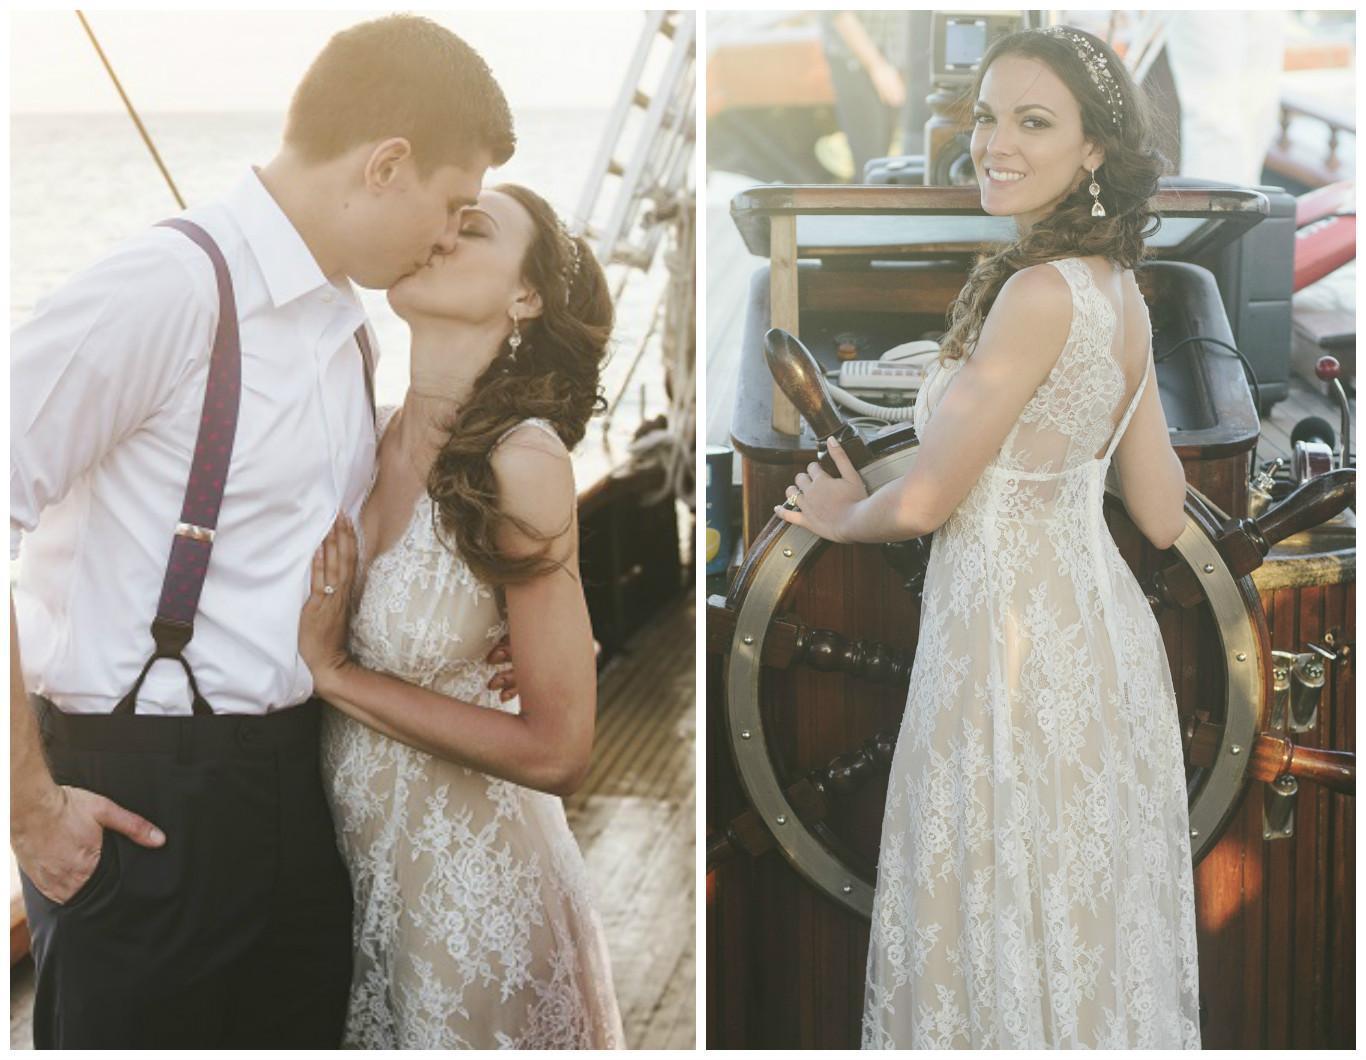 Aruba Destination Wedding| Aruba Beach Wedding | Sabrina and Sasha Aruba Wedding Story